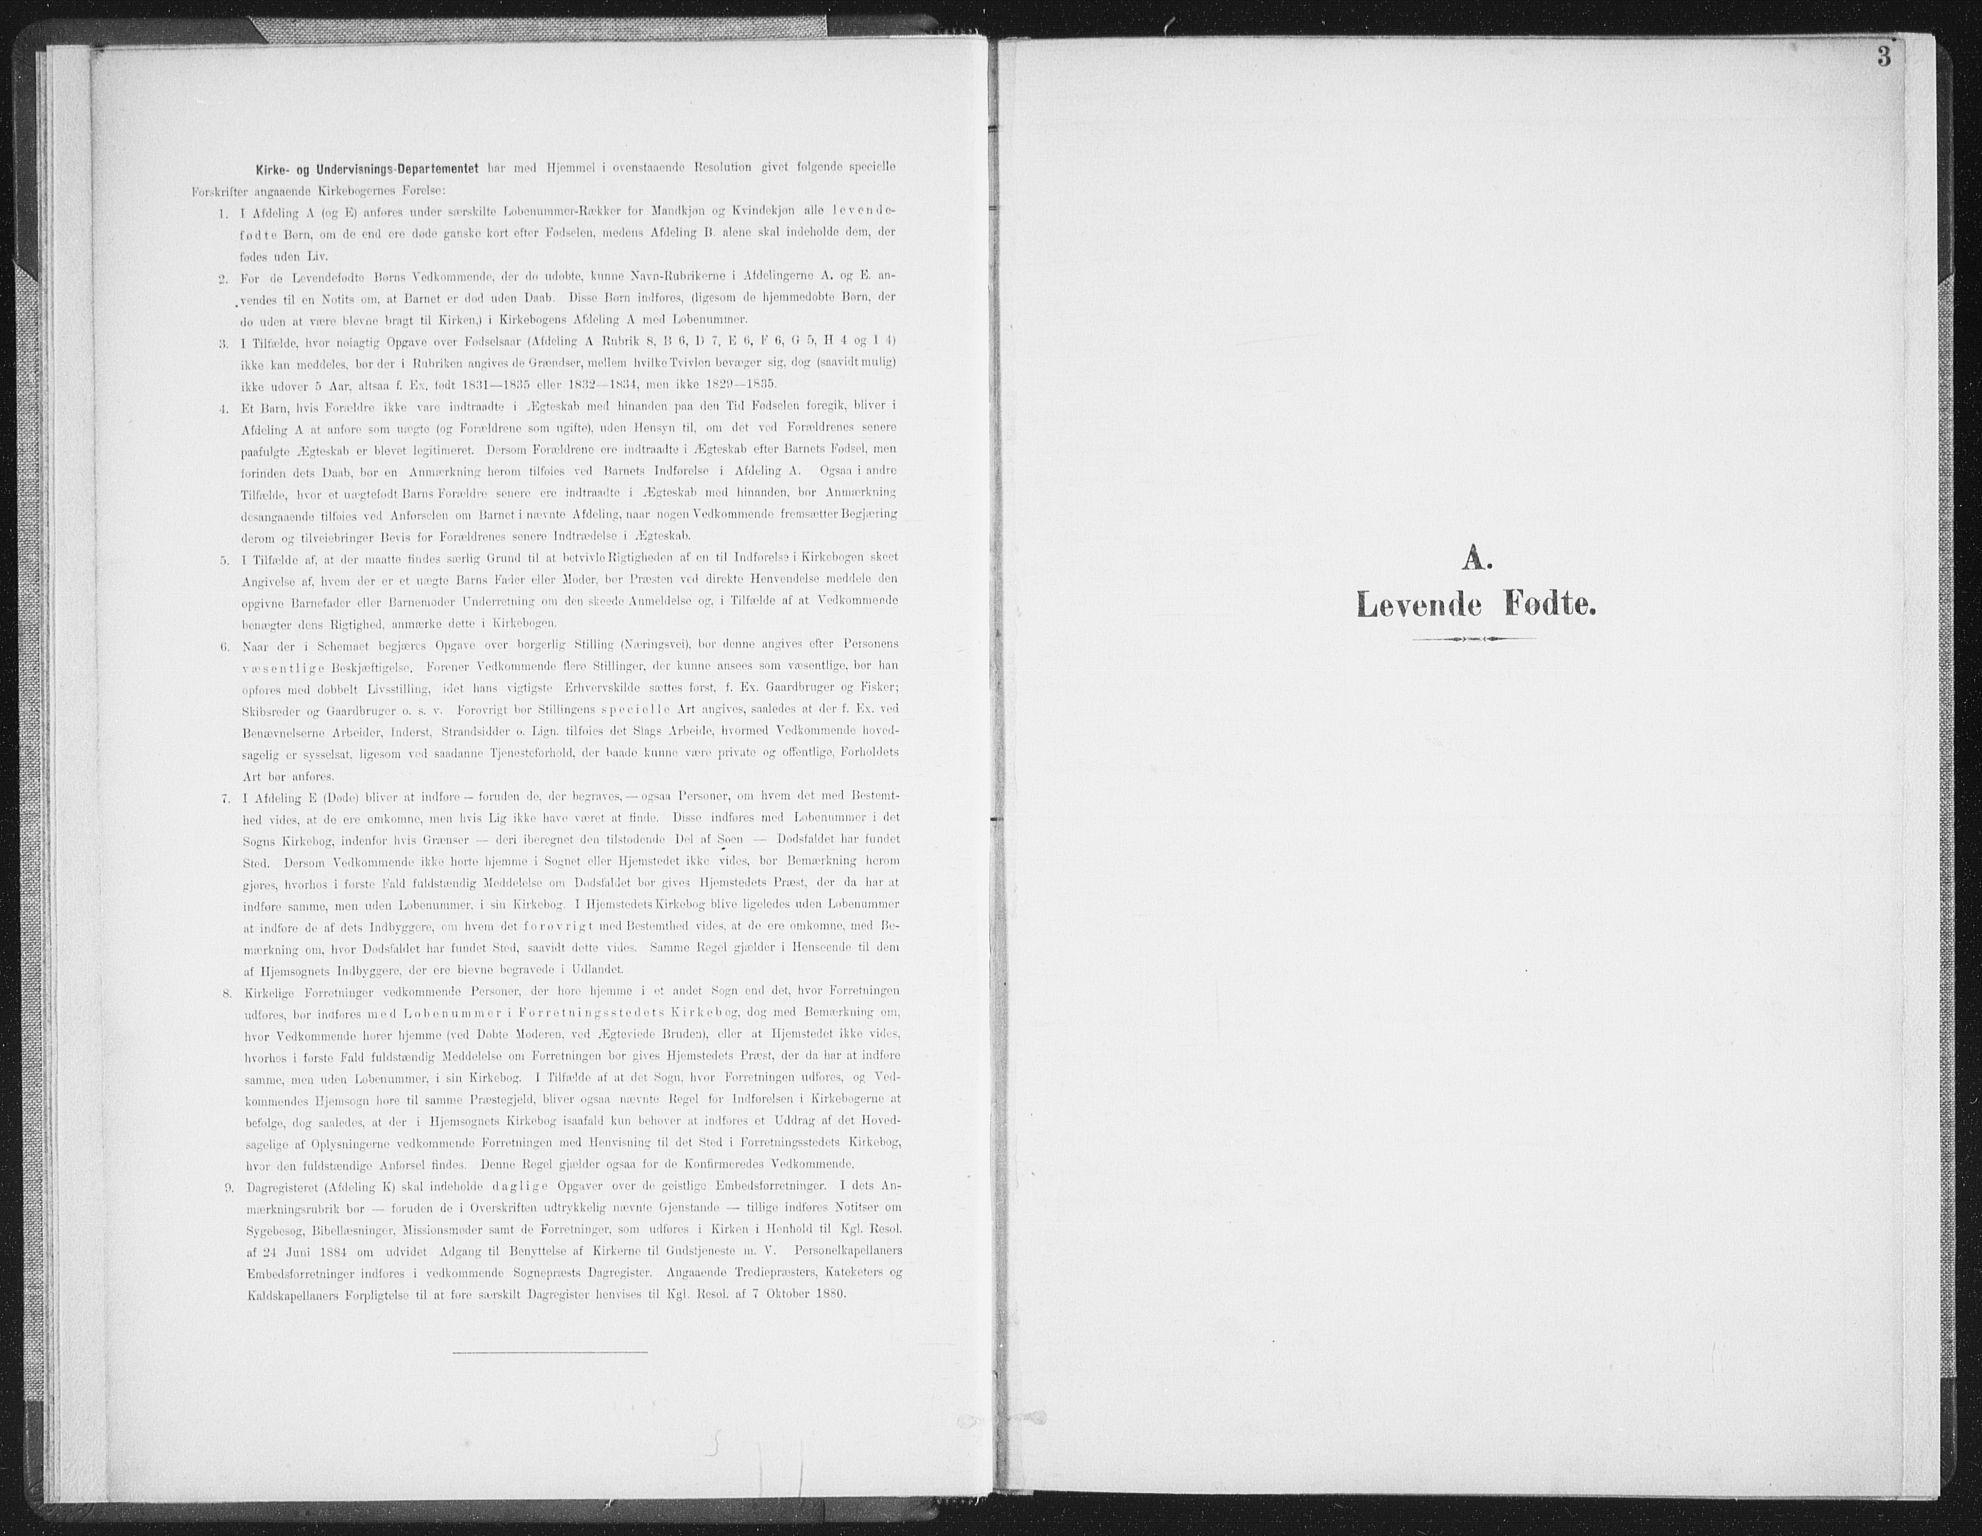 SAT, Ministerialprotokoller, klokkerbøker og fødselsregistre - Nordland, 897/L1400: Ministerialbok nr. 897A07, 1897-1908, s. 3